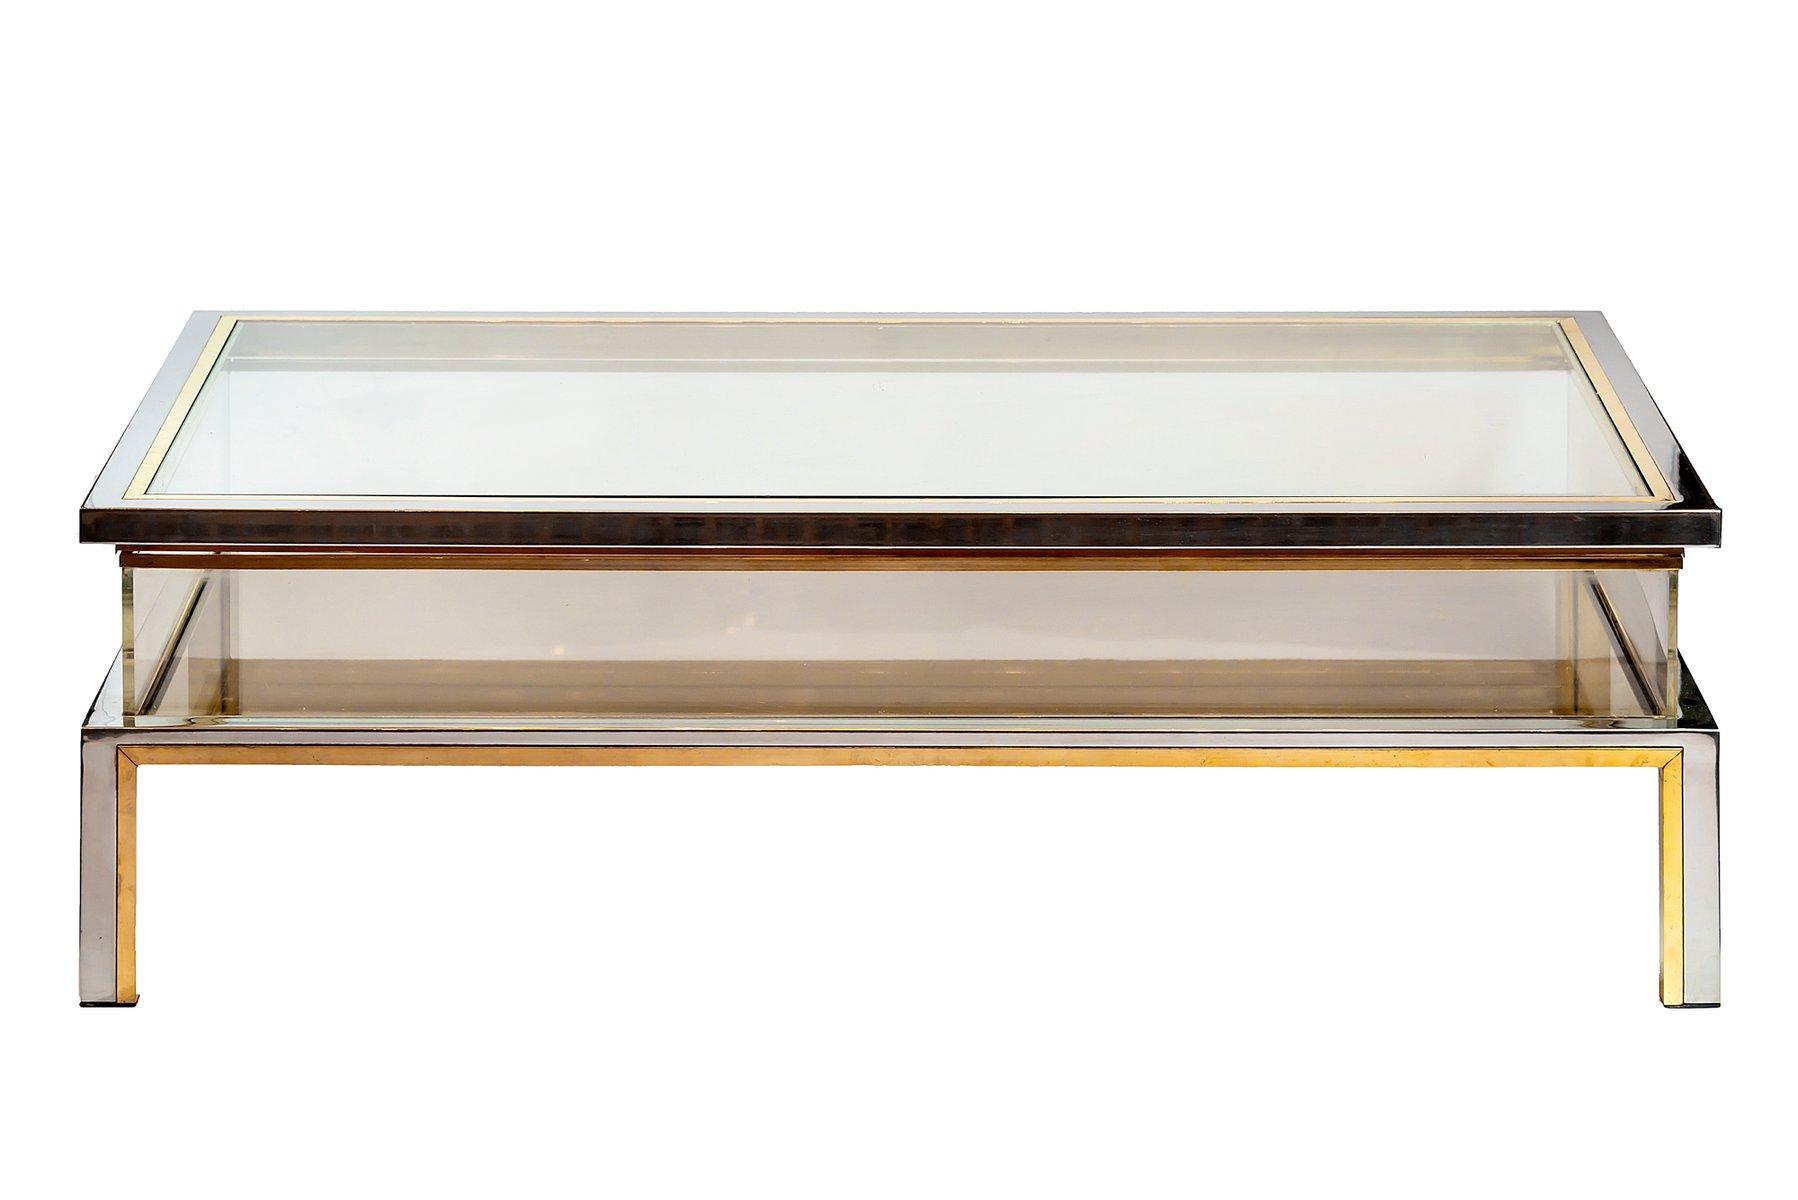 Mid century brass glass coffee table by romeo rega